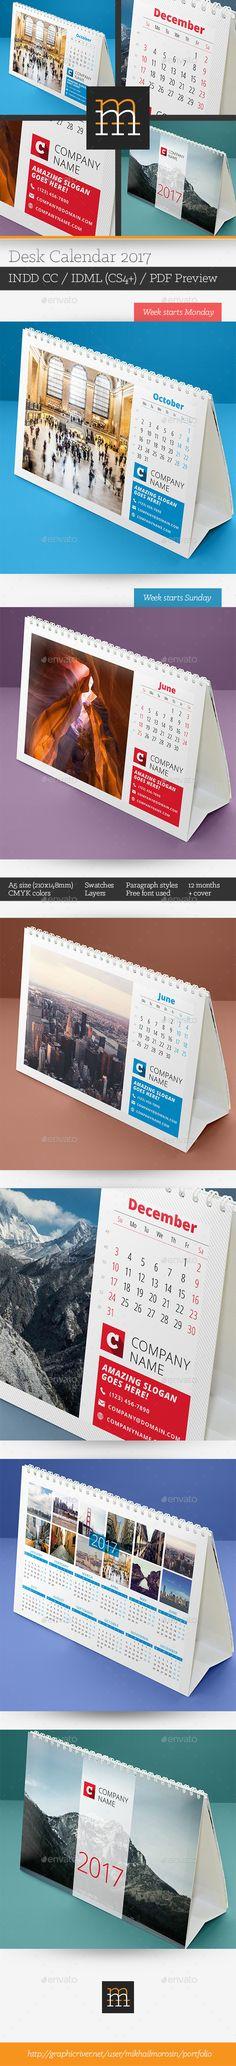 Desk Calendar   Desk Calendars Calendars  And Desks